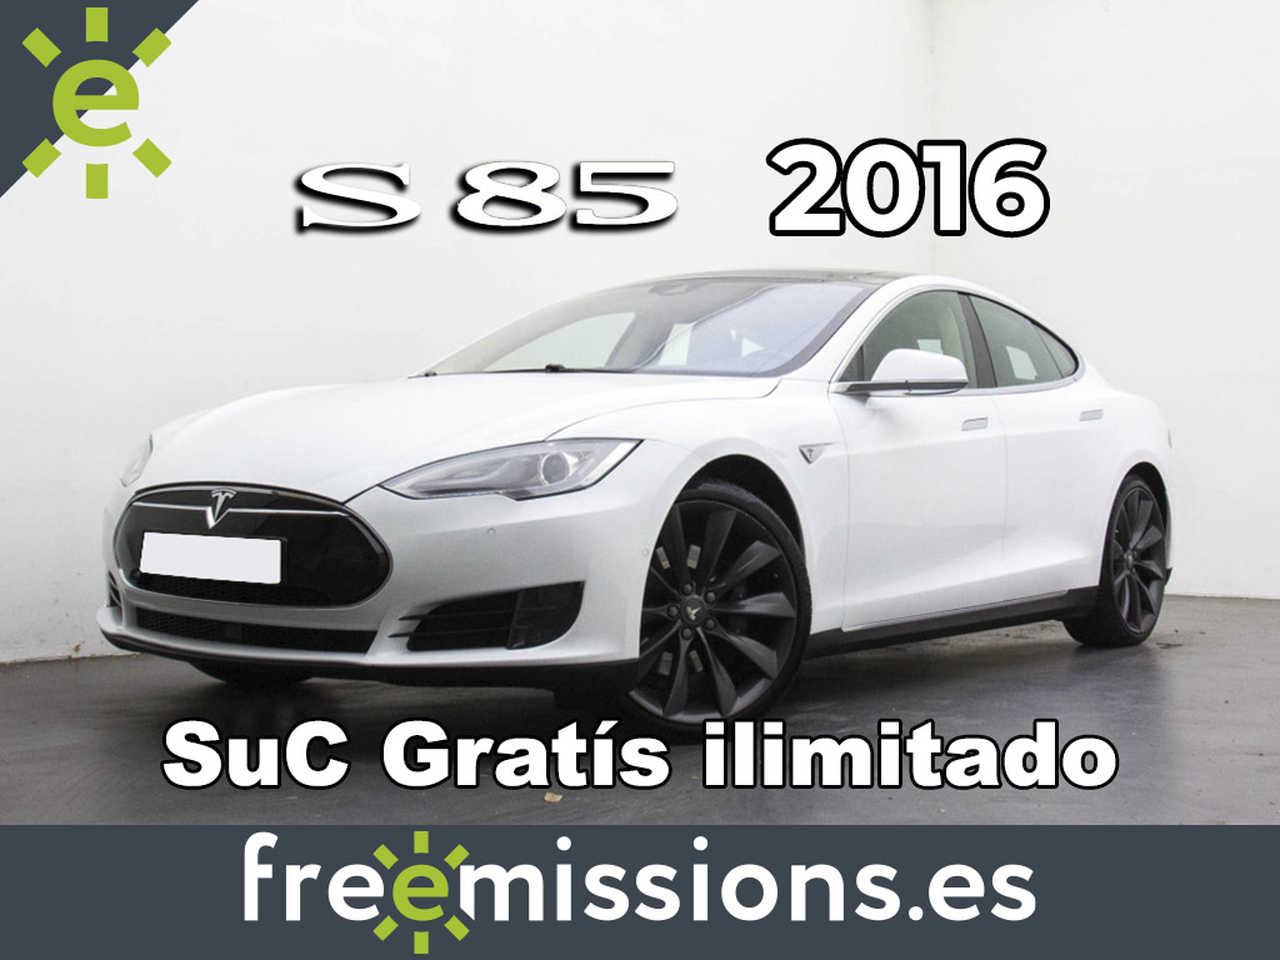 Tesla Model  S 2016 Turbine 21 SuC Gratis   - Foto 1